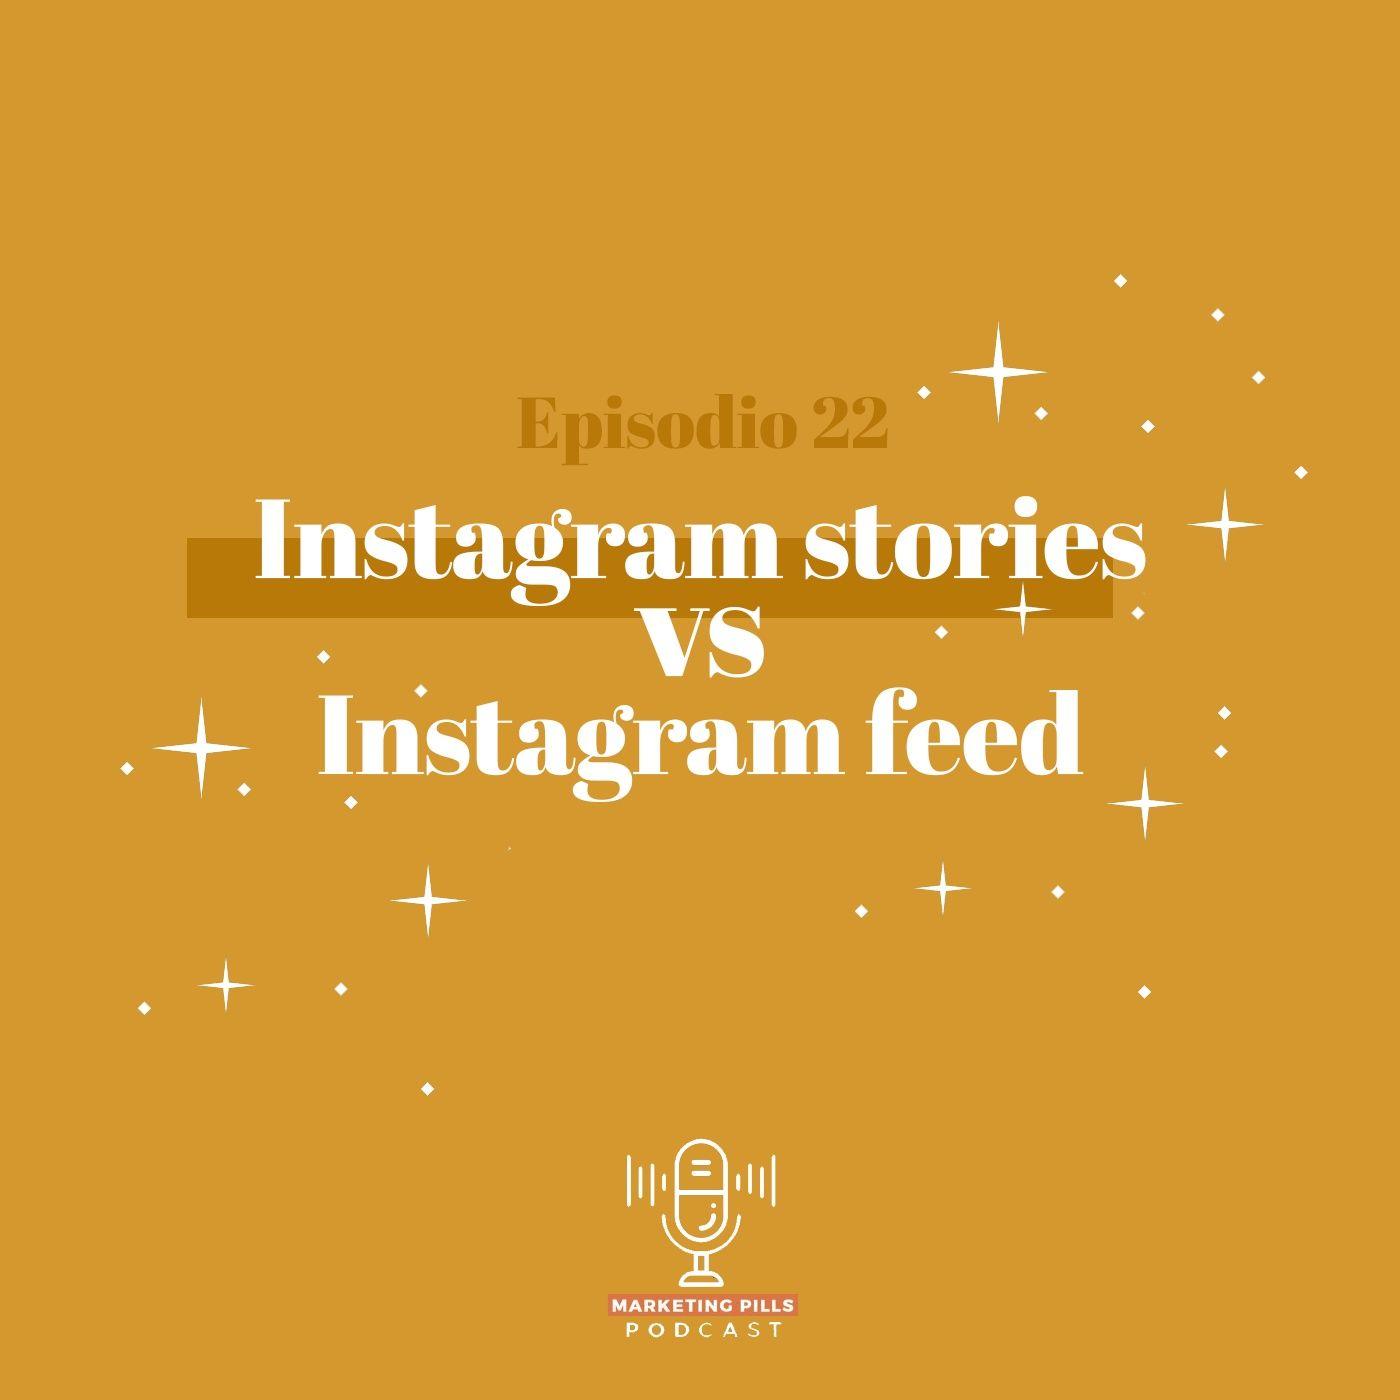 ⚡Episodio 22 - Instagram Stories vs Instagram Feed